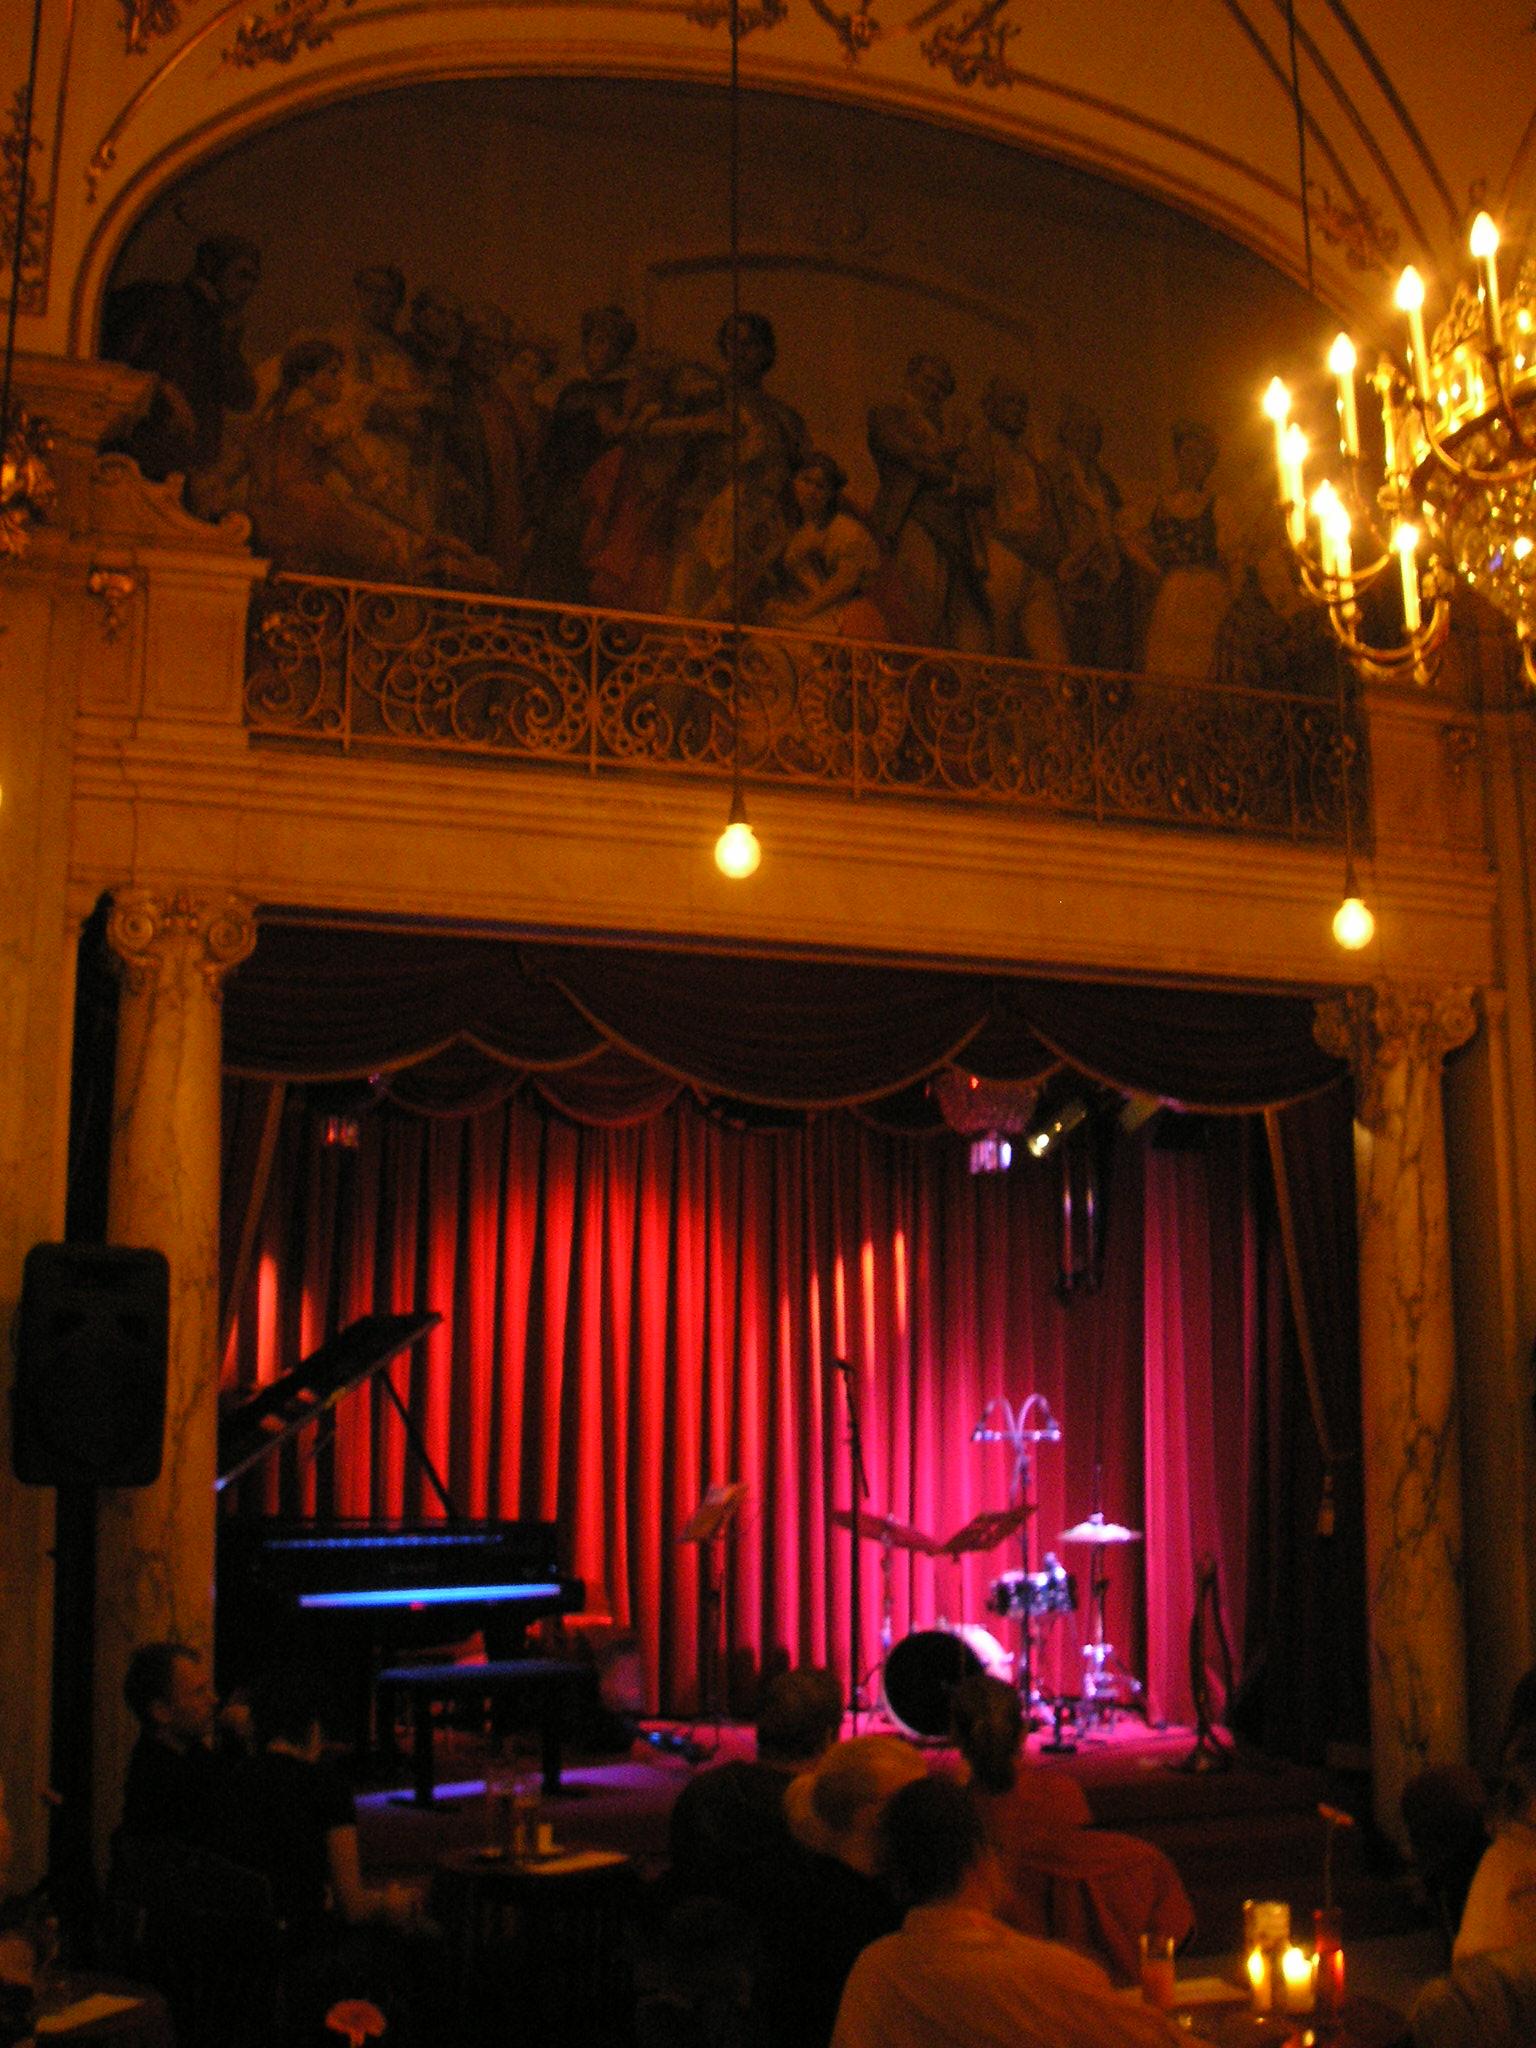 Filevolkstheater Vienna Sept 2006 001jpg Wikimedia Commons